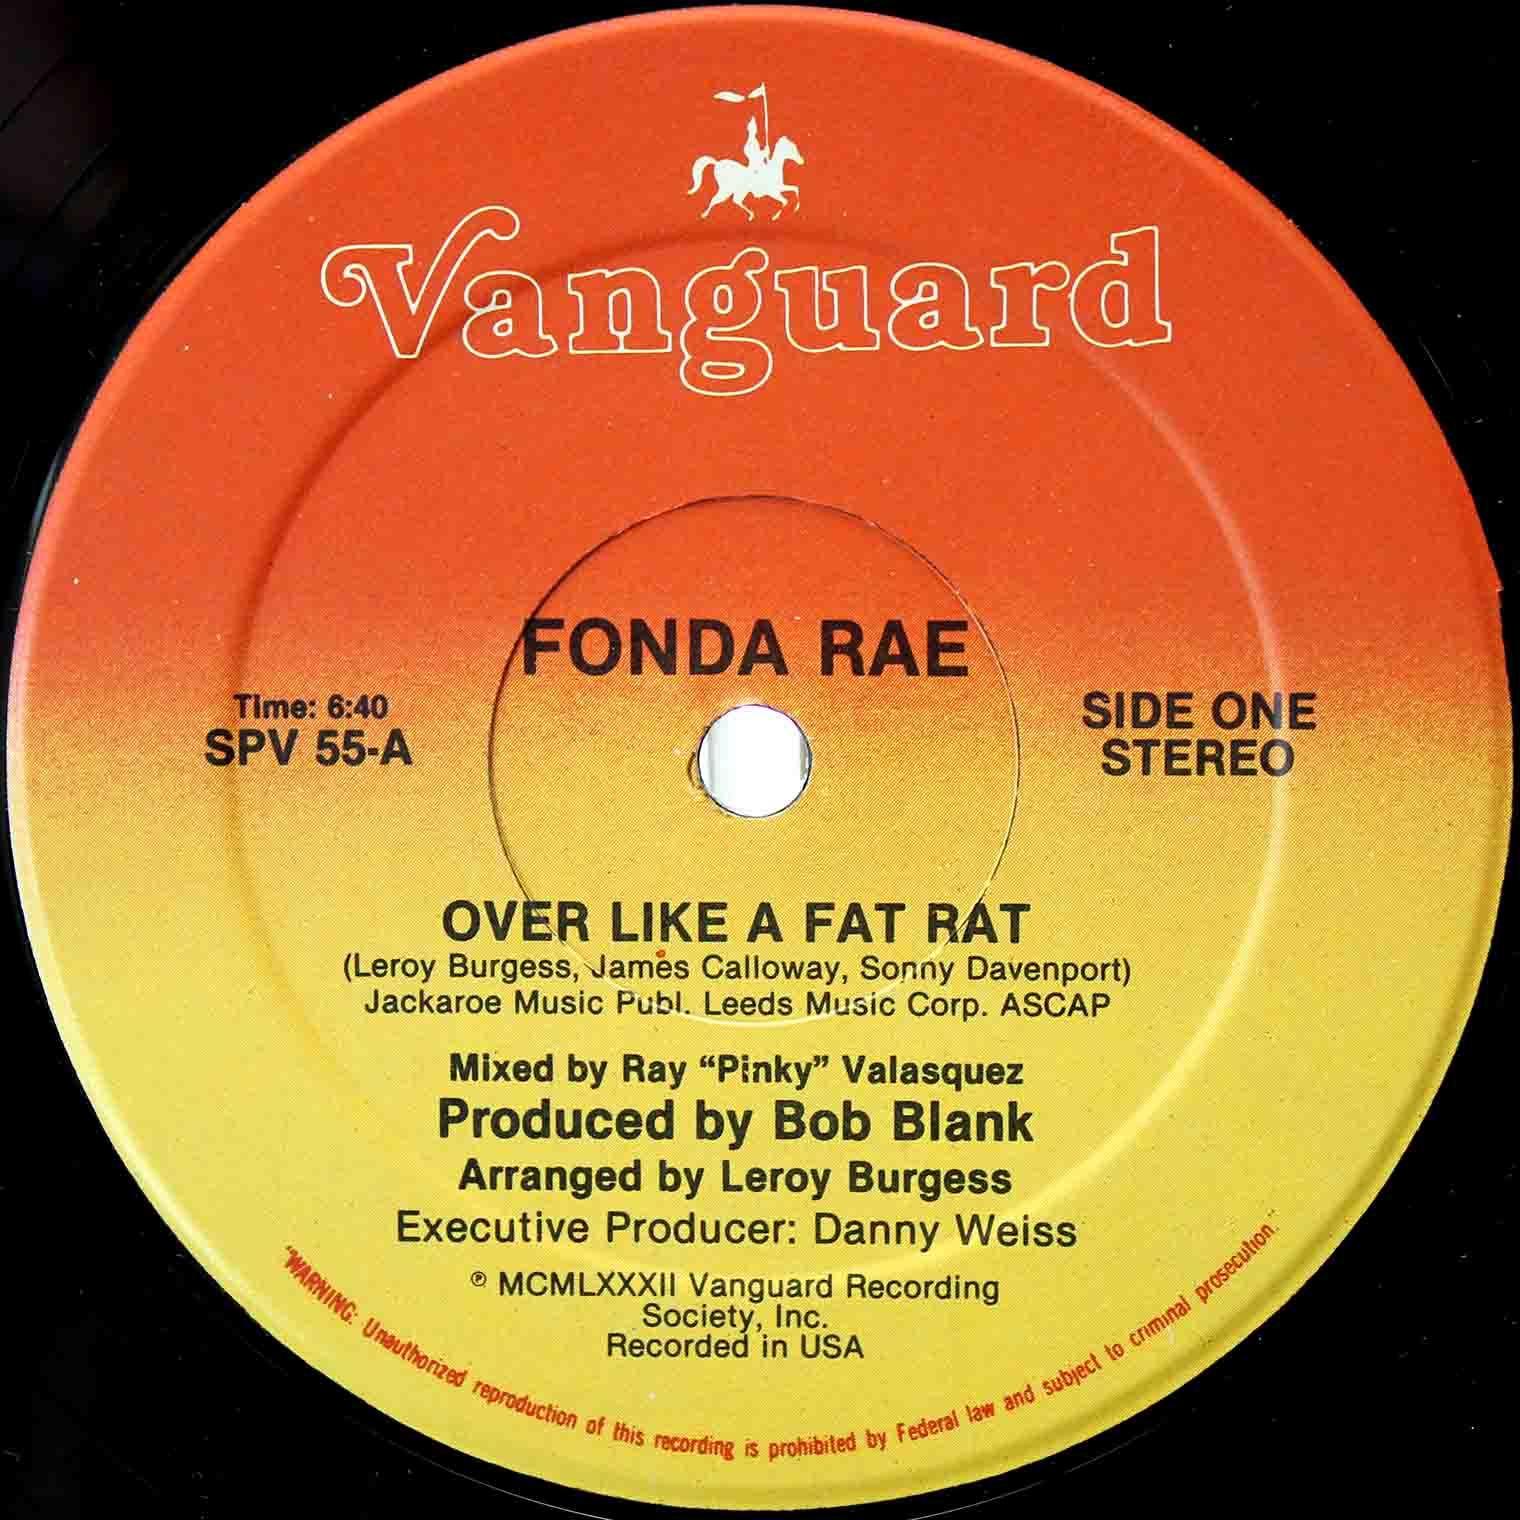 Fonda Rae Over Like Fat Rat 03